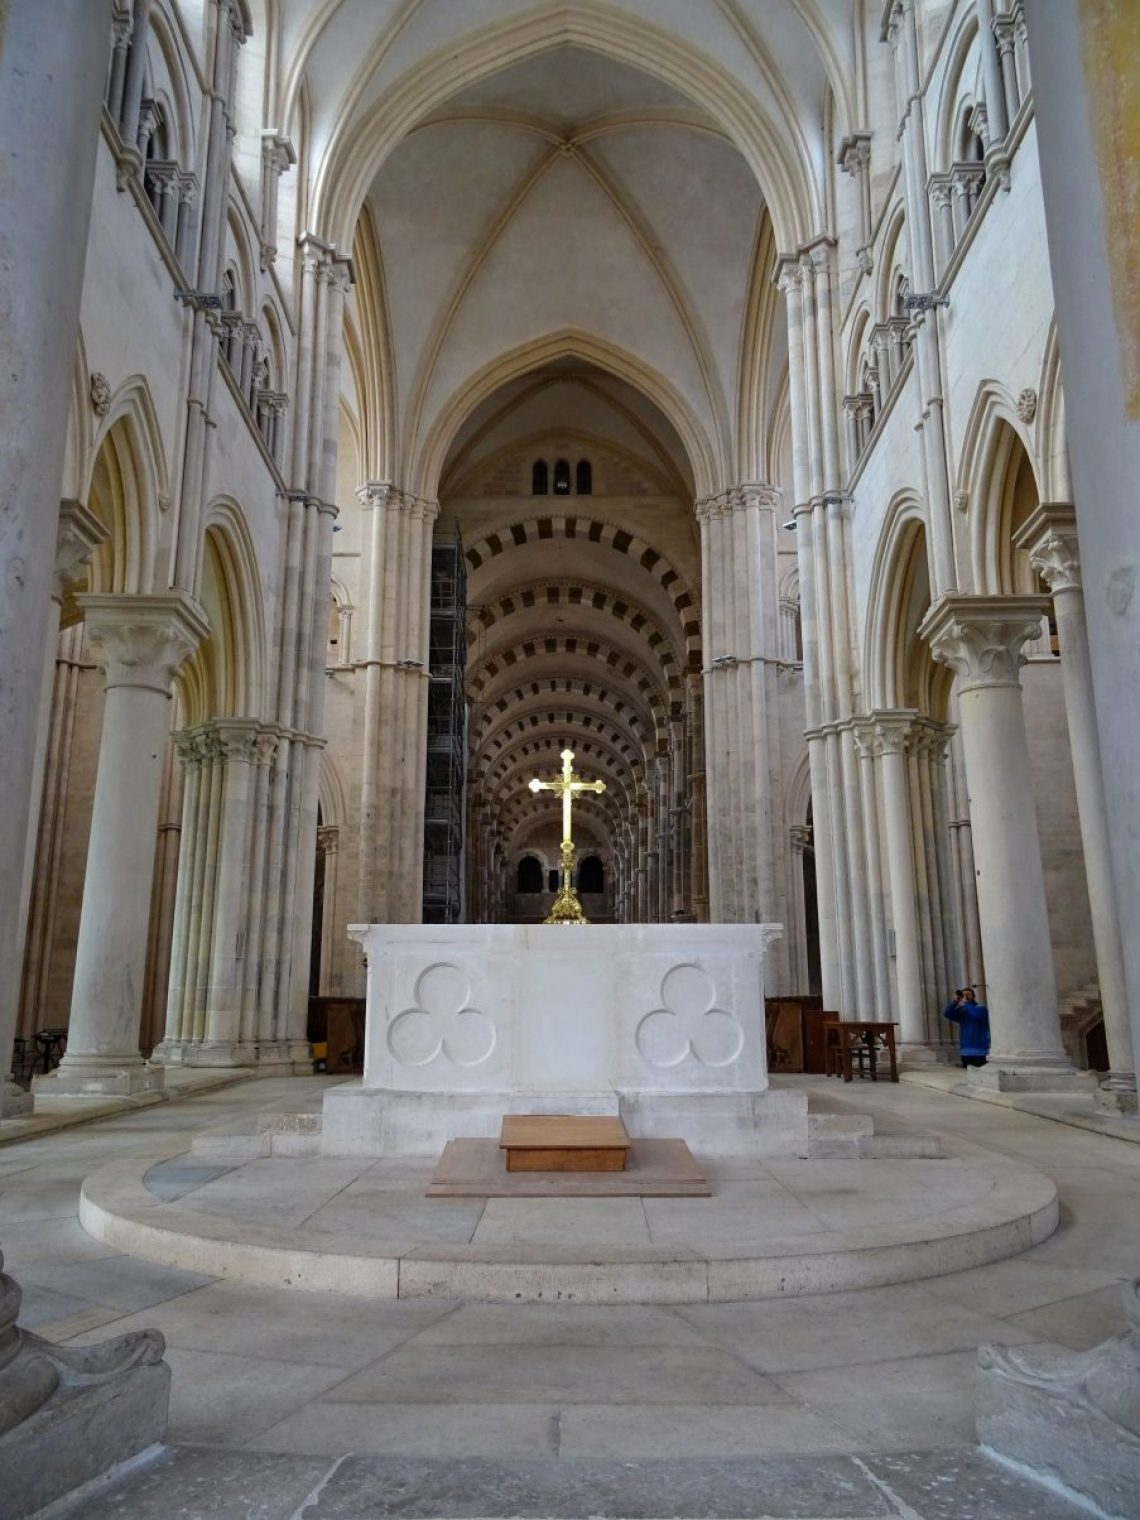 Interior of Vézelay Basilica